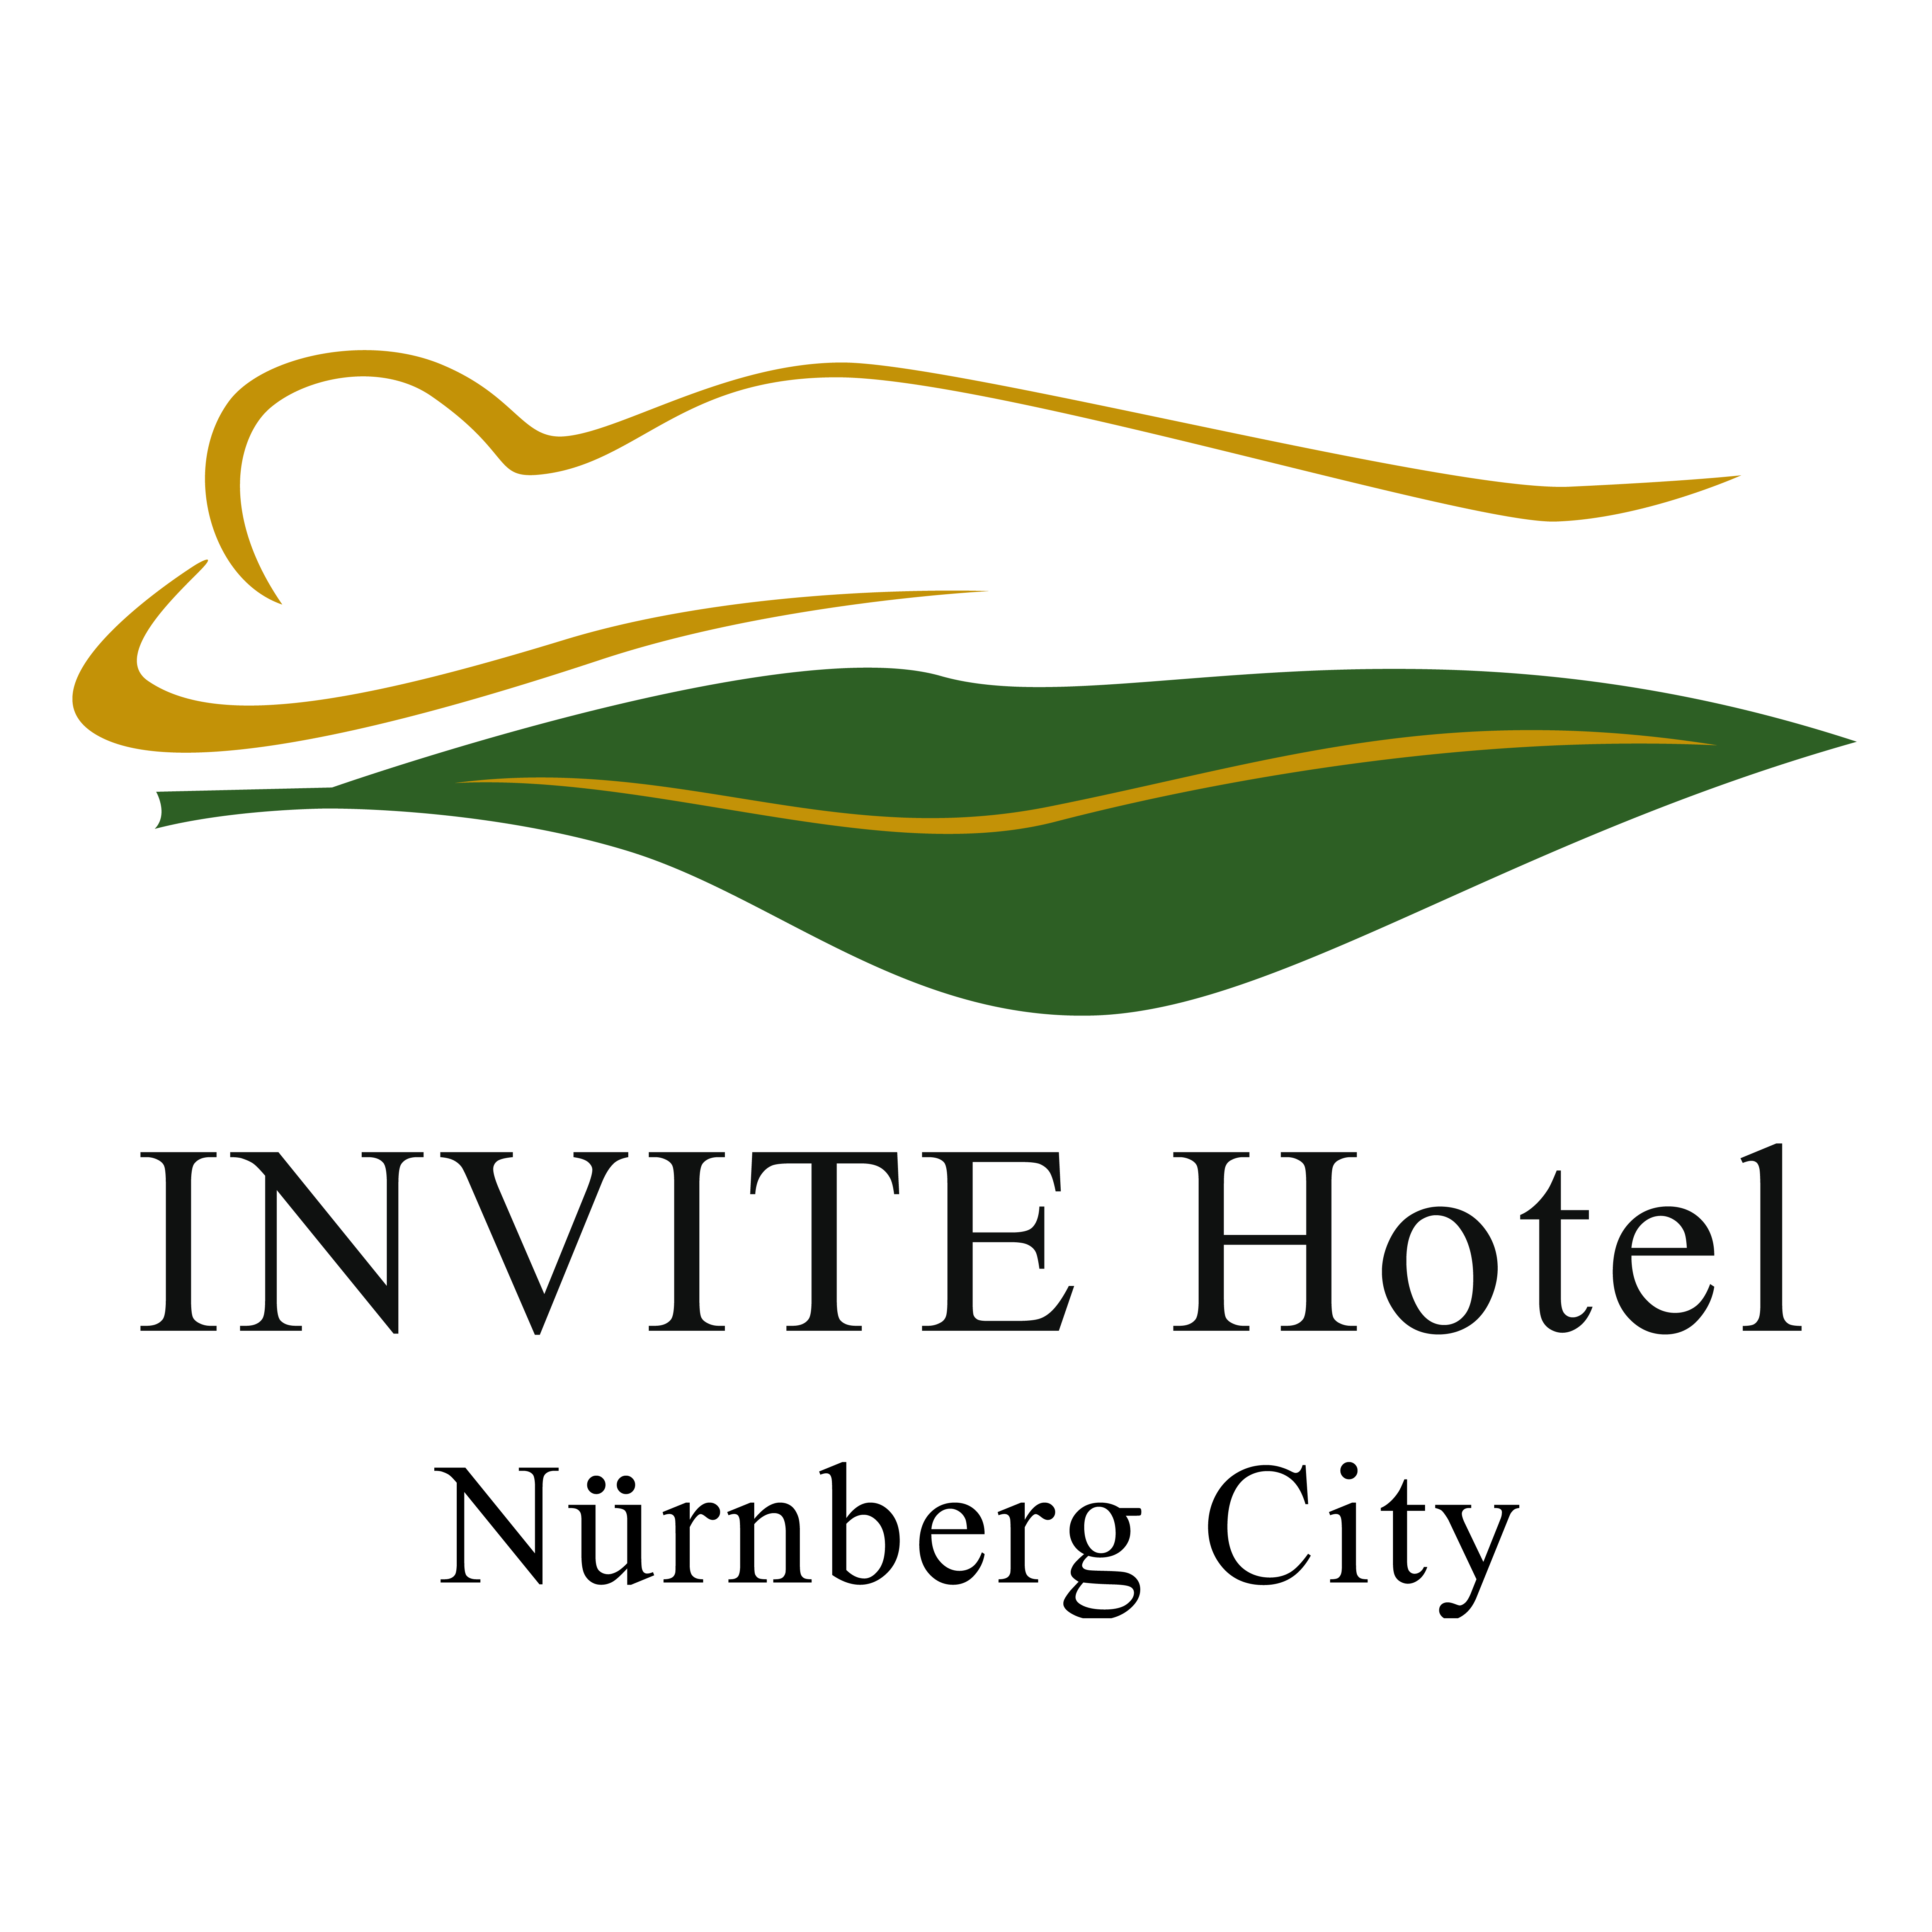 Invite Hotel Nürnberg City <span class='star'>*</span><span class='star'>*</span><span class='star'>*</span>